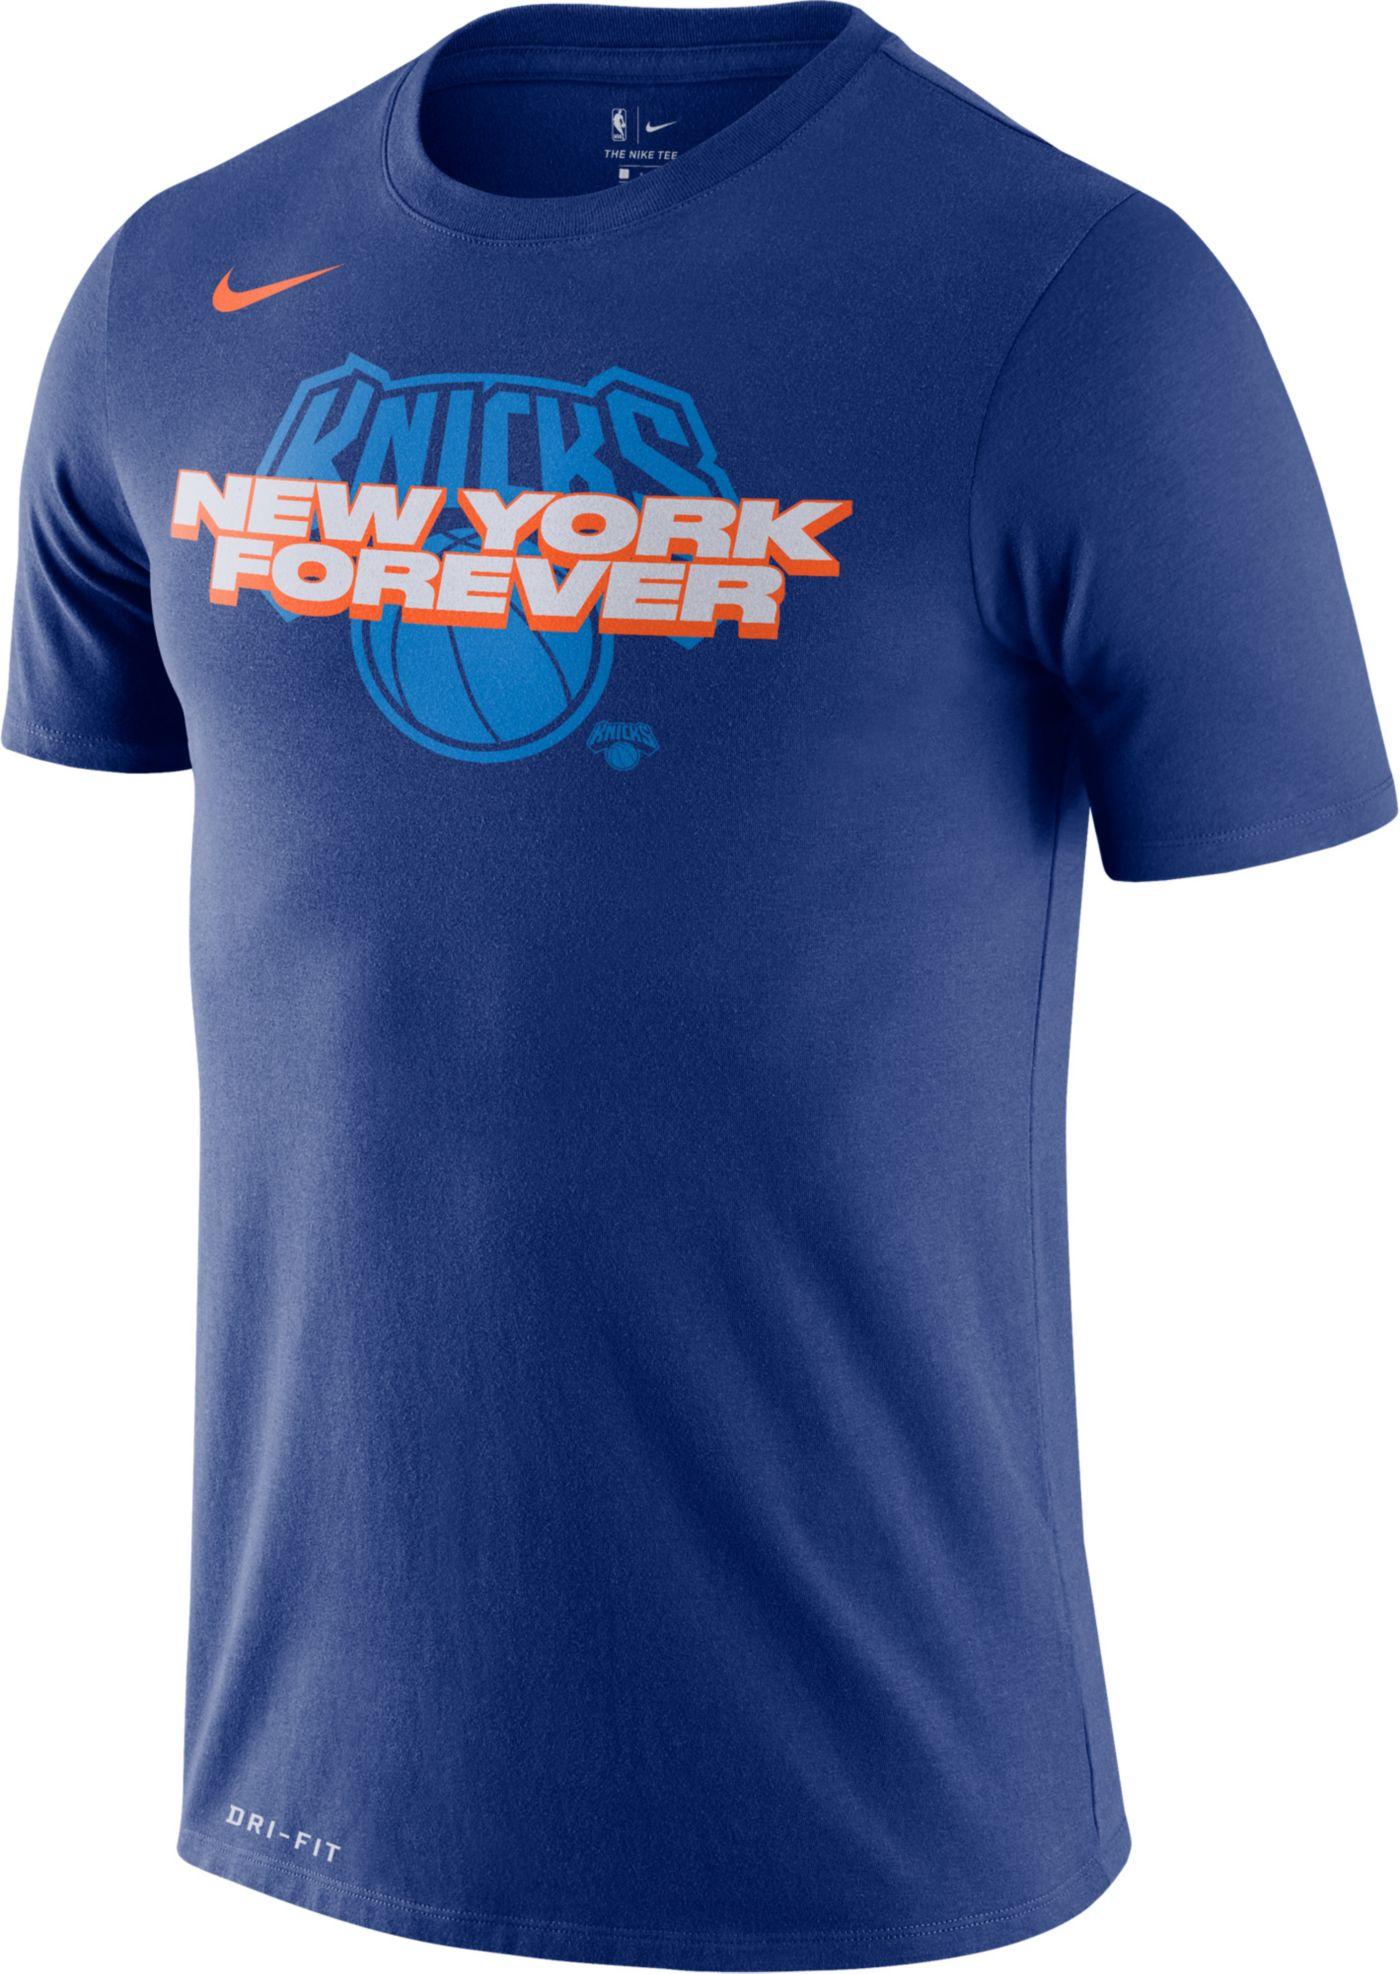 Nike Men's New York Knicks Dri-FIT Mantra T-Shirt